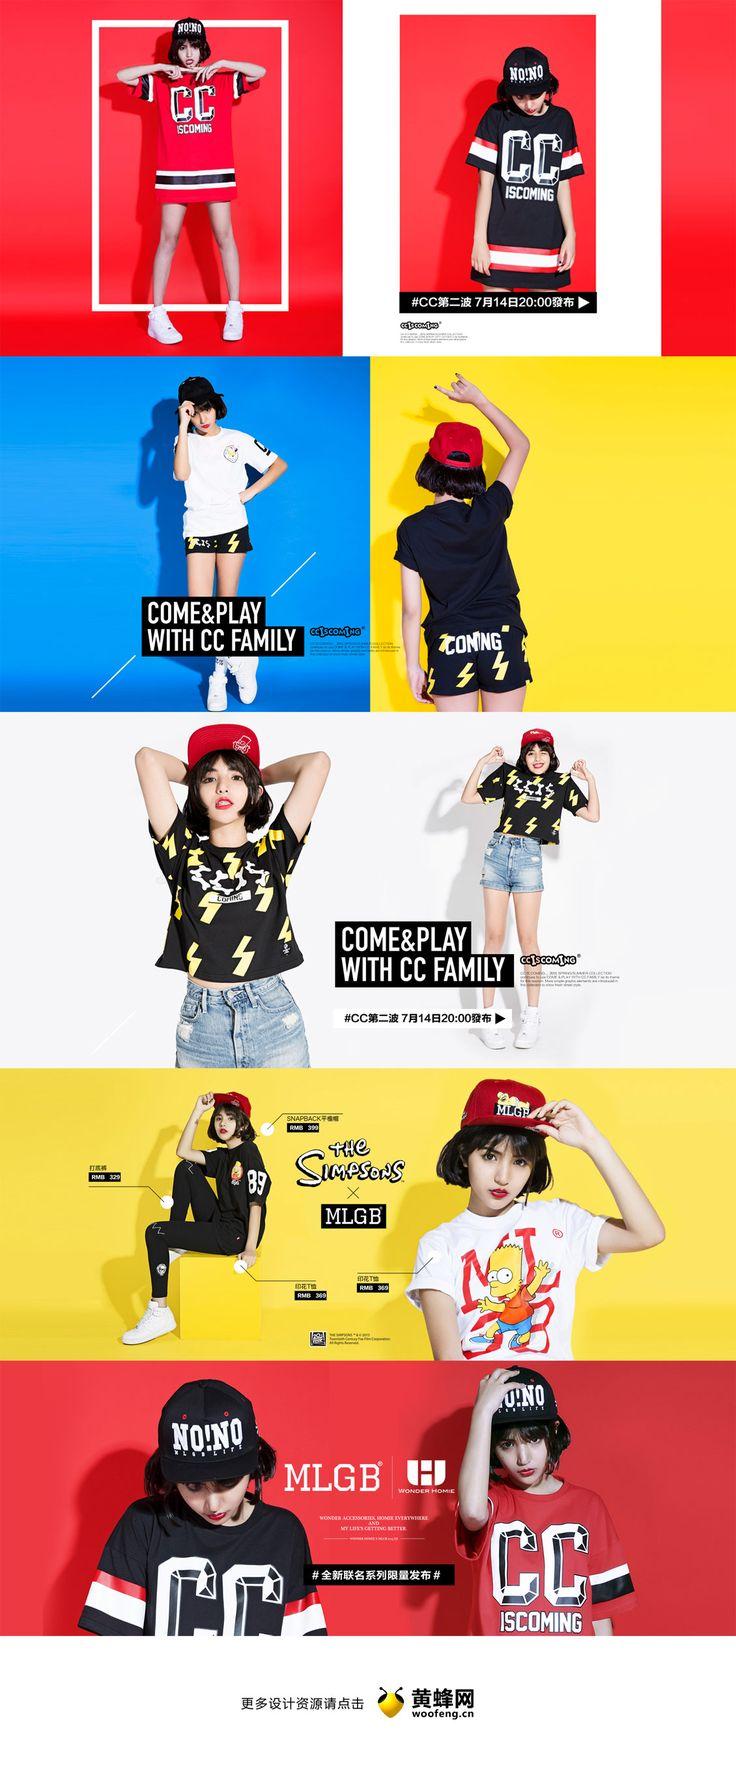 NPC服饰banner设计,来源自黄蜂网http://woofeng.cn/